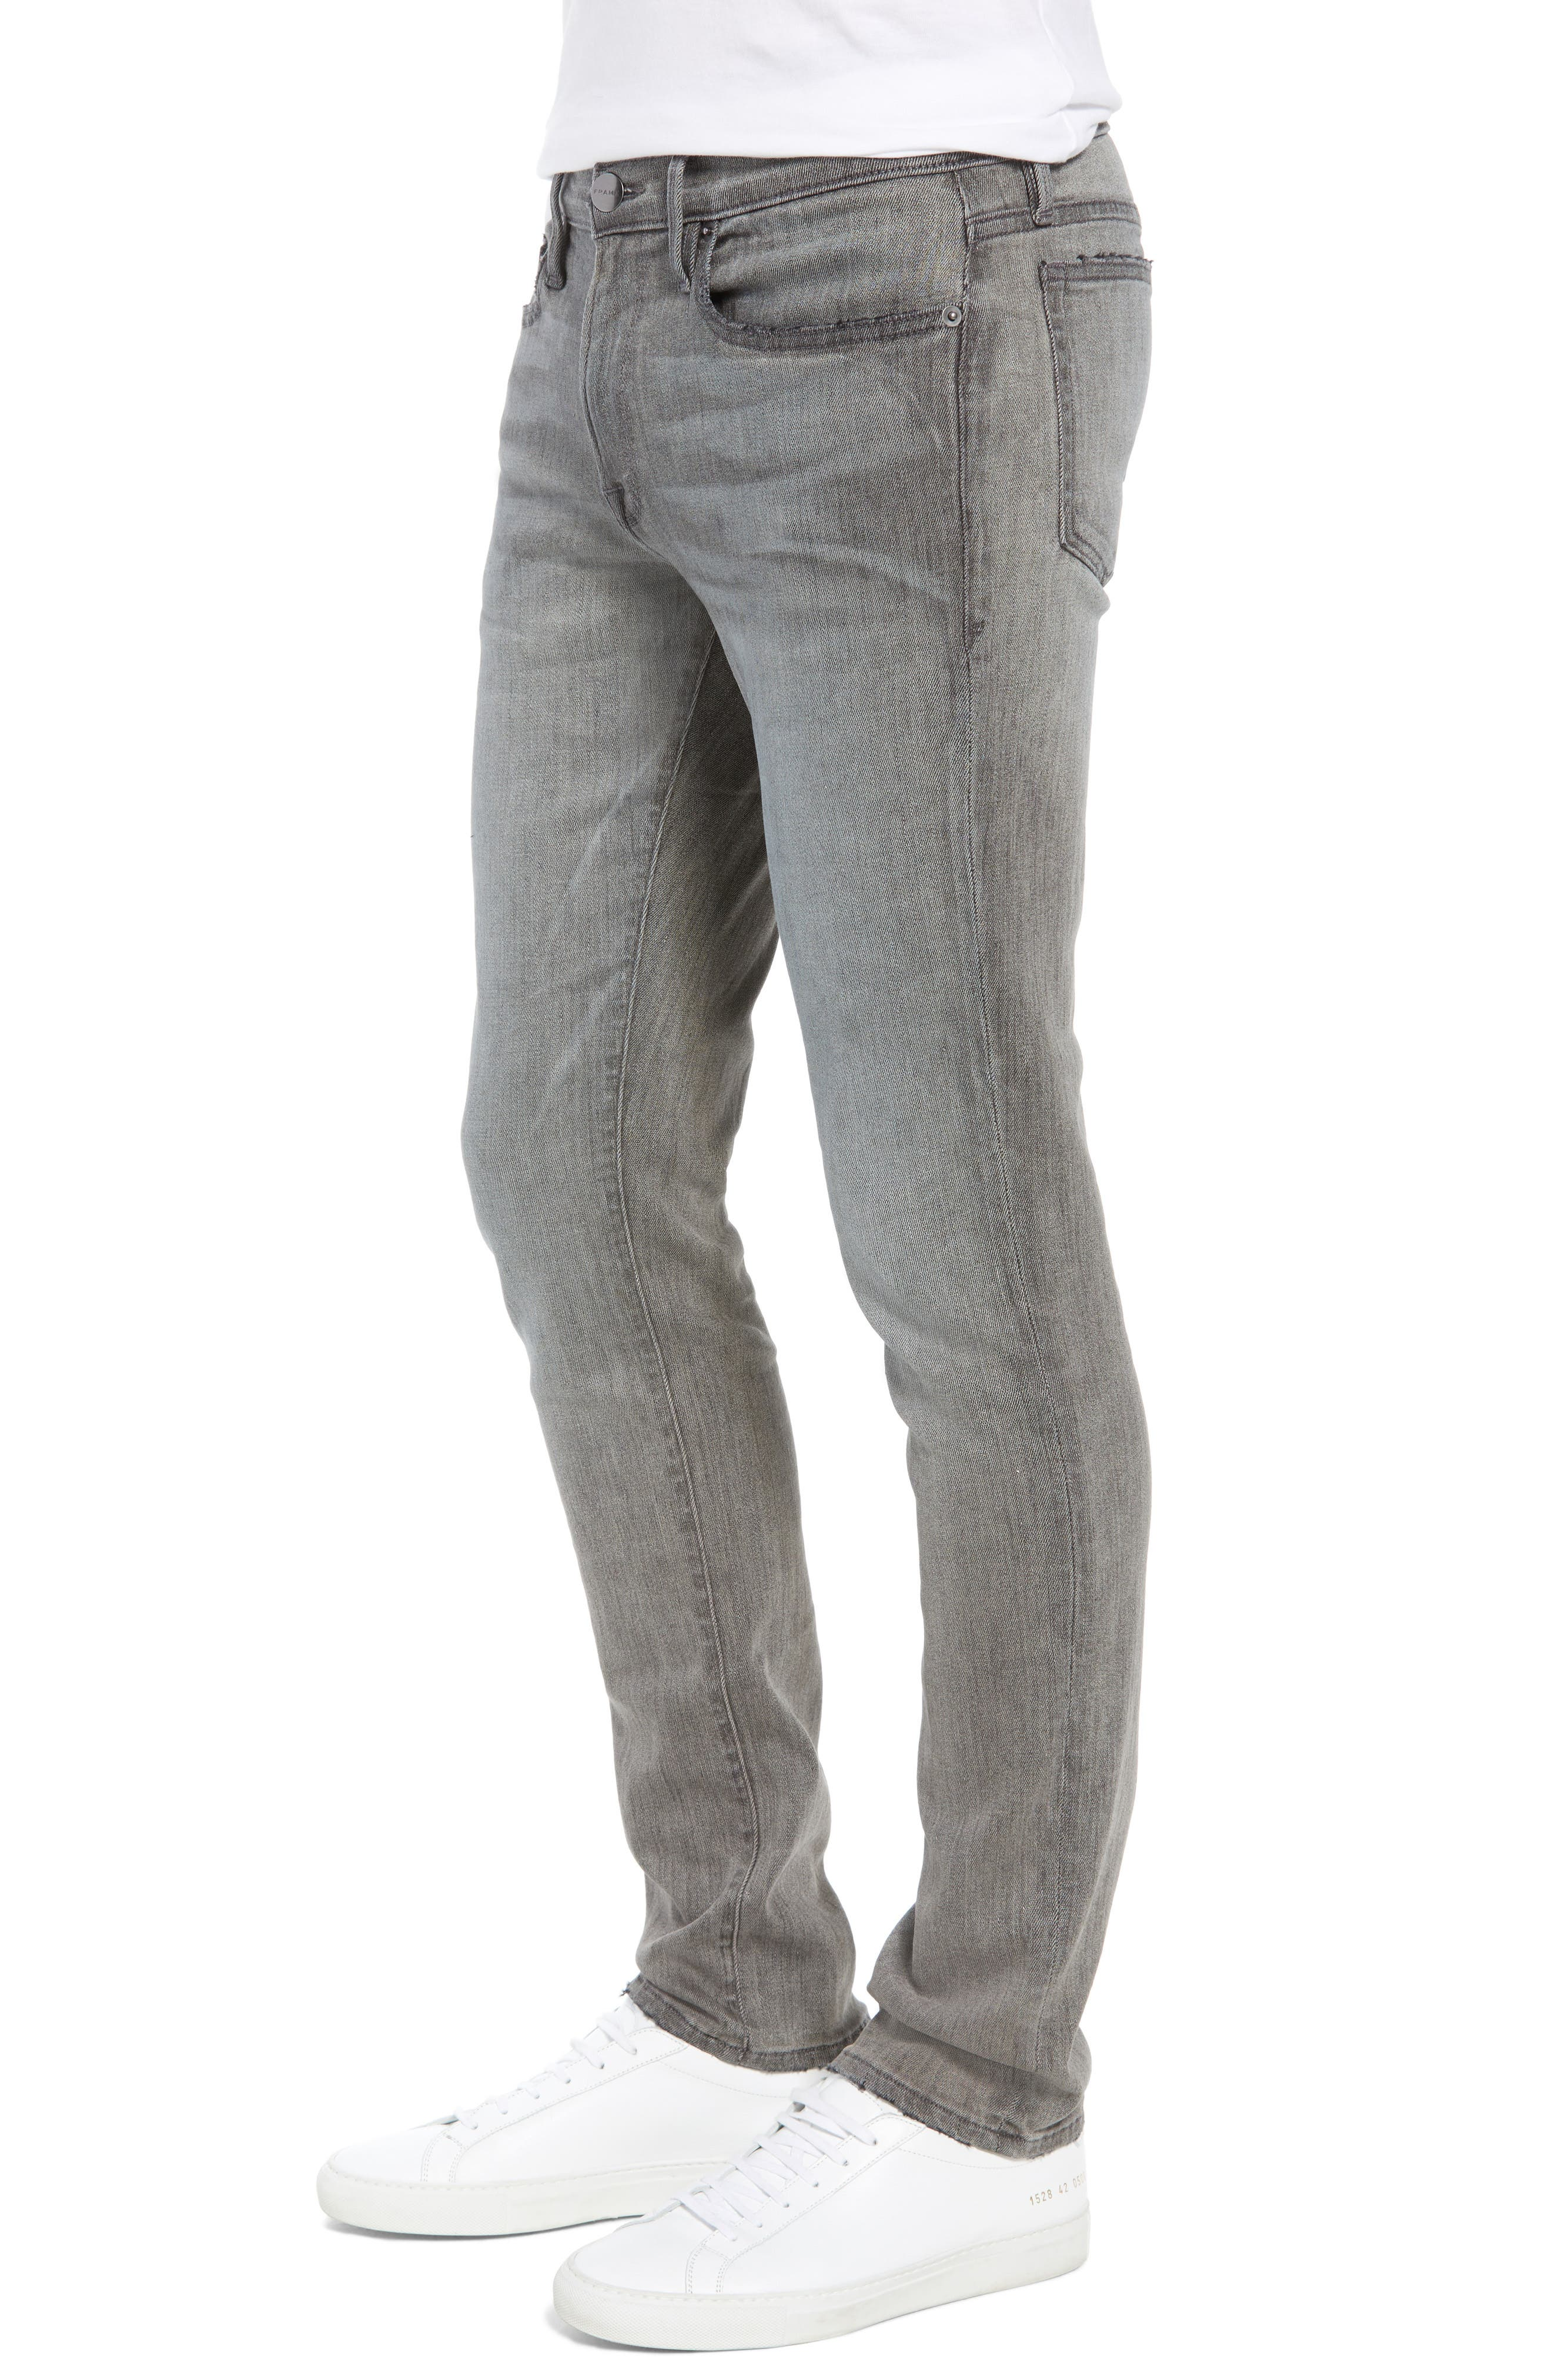 L'Homme Skinny Skinny Fit Jeans,                             Alternate thumbnail 3, color,                             FORT MCHEN